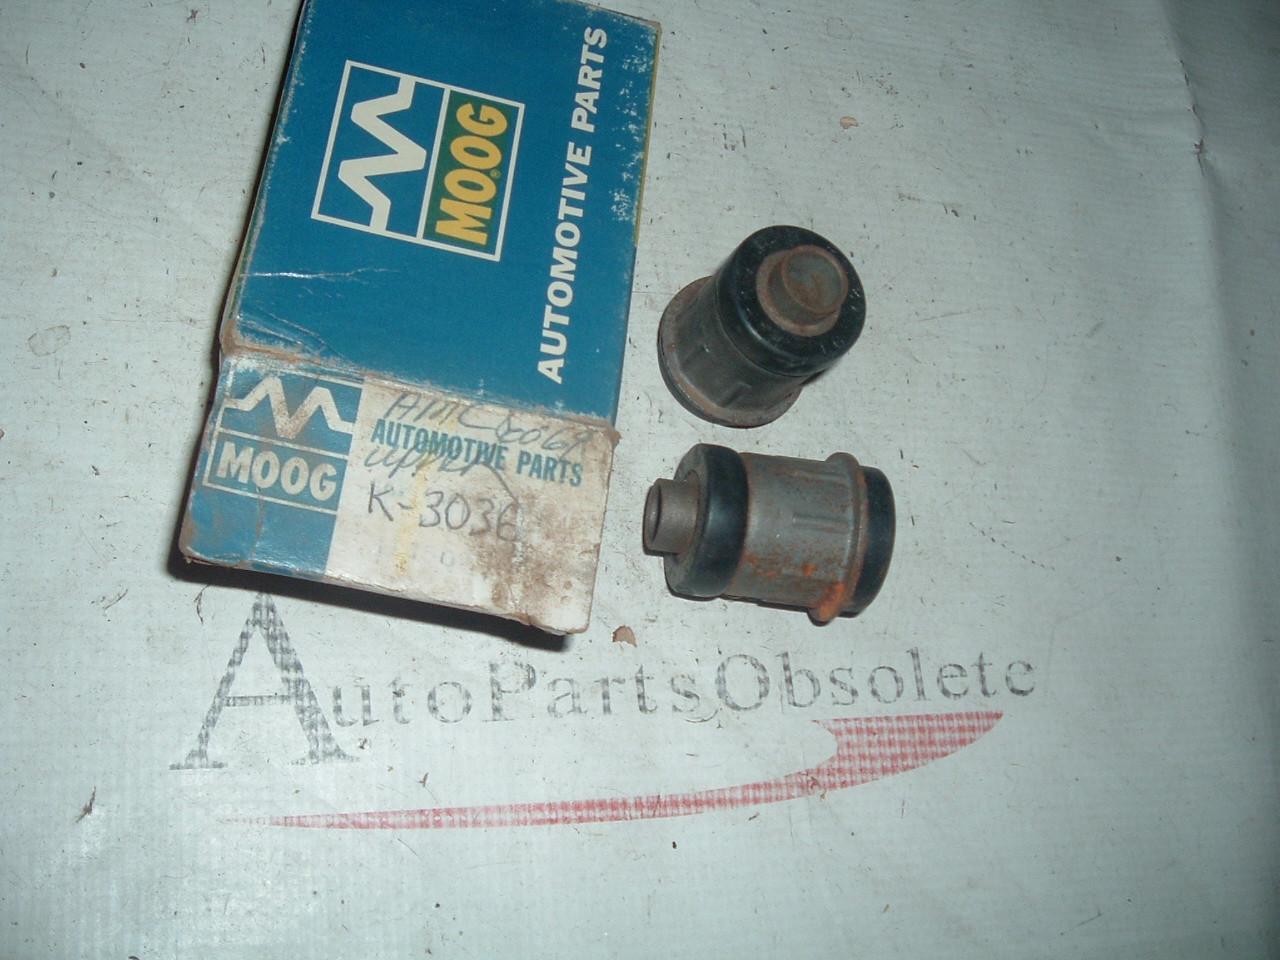 1964 65 66 67 68 69 rambler upper control arm busgings 1pr 3149622 K-3036 (z k-3036)